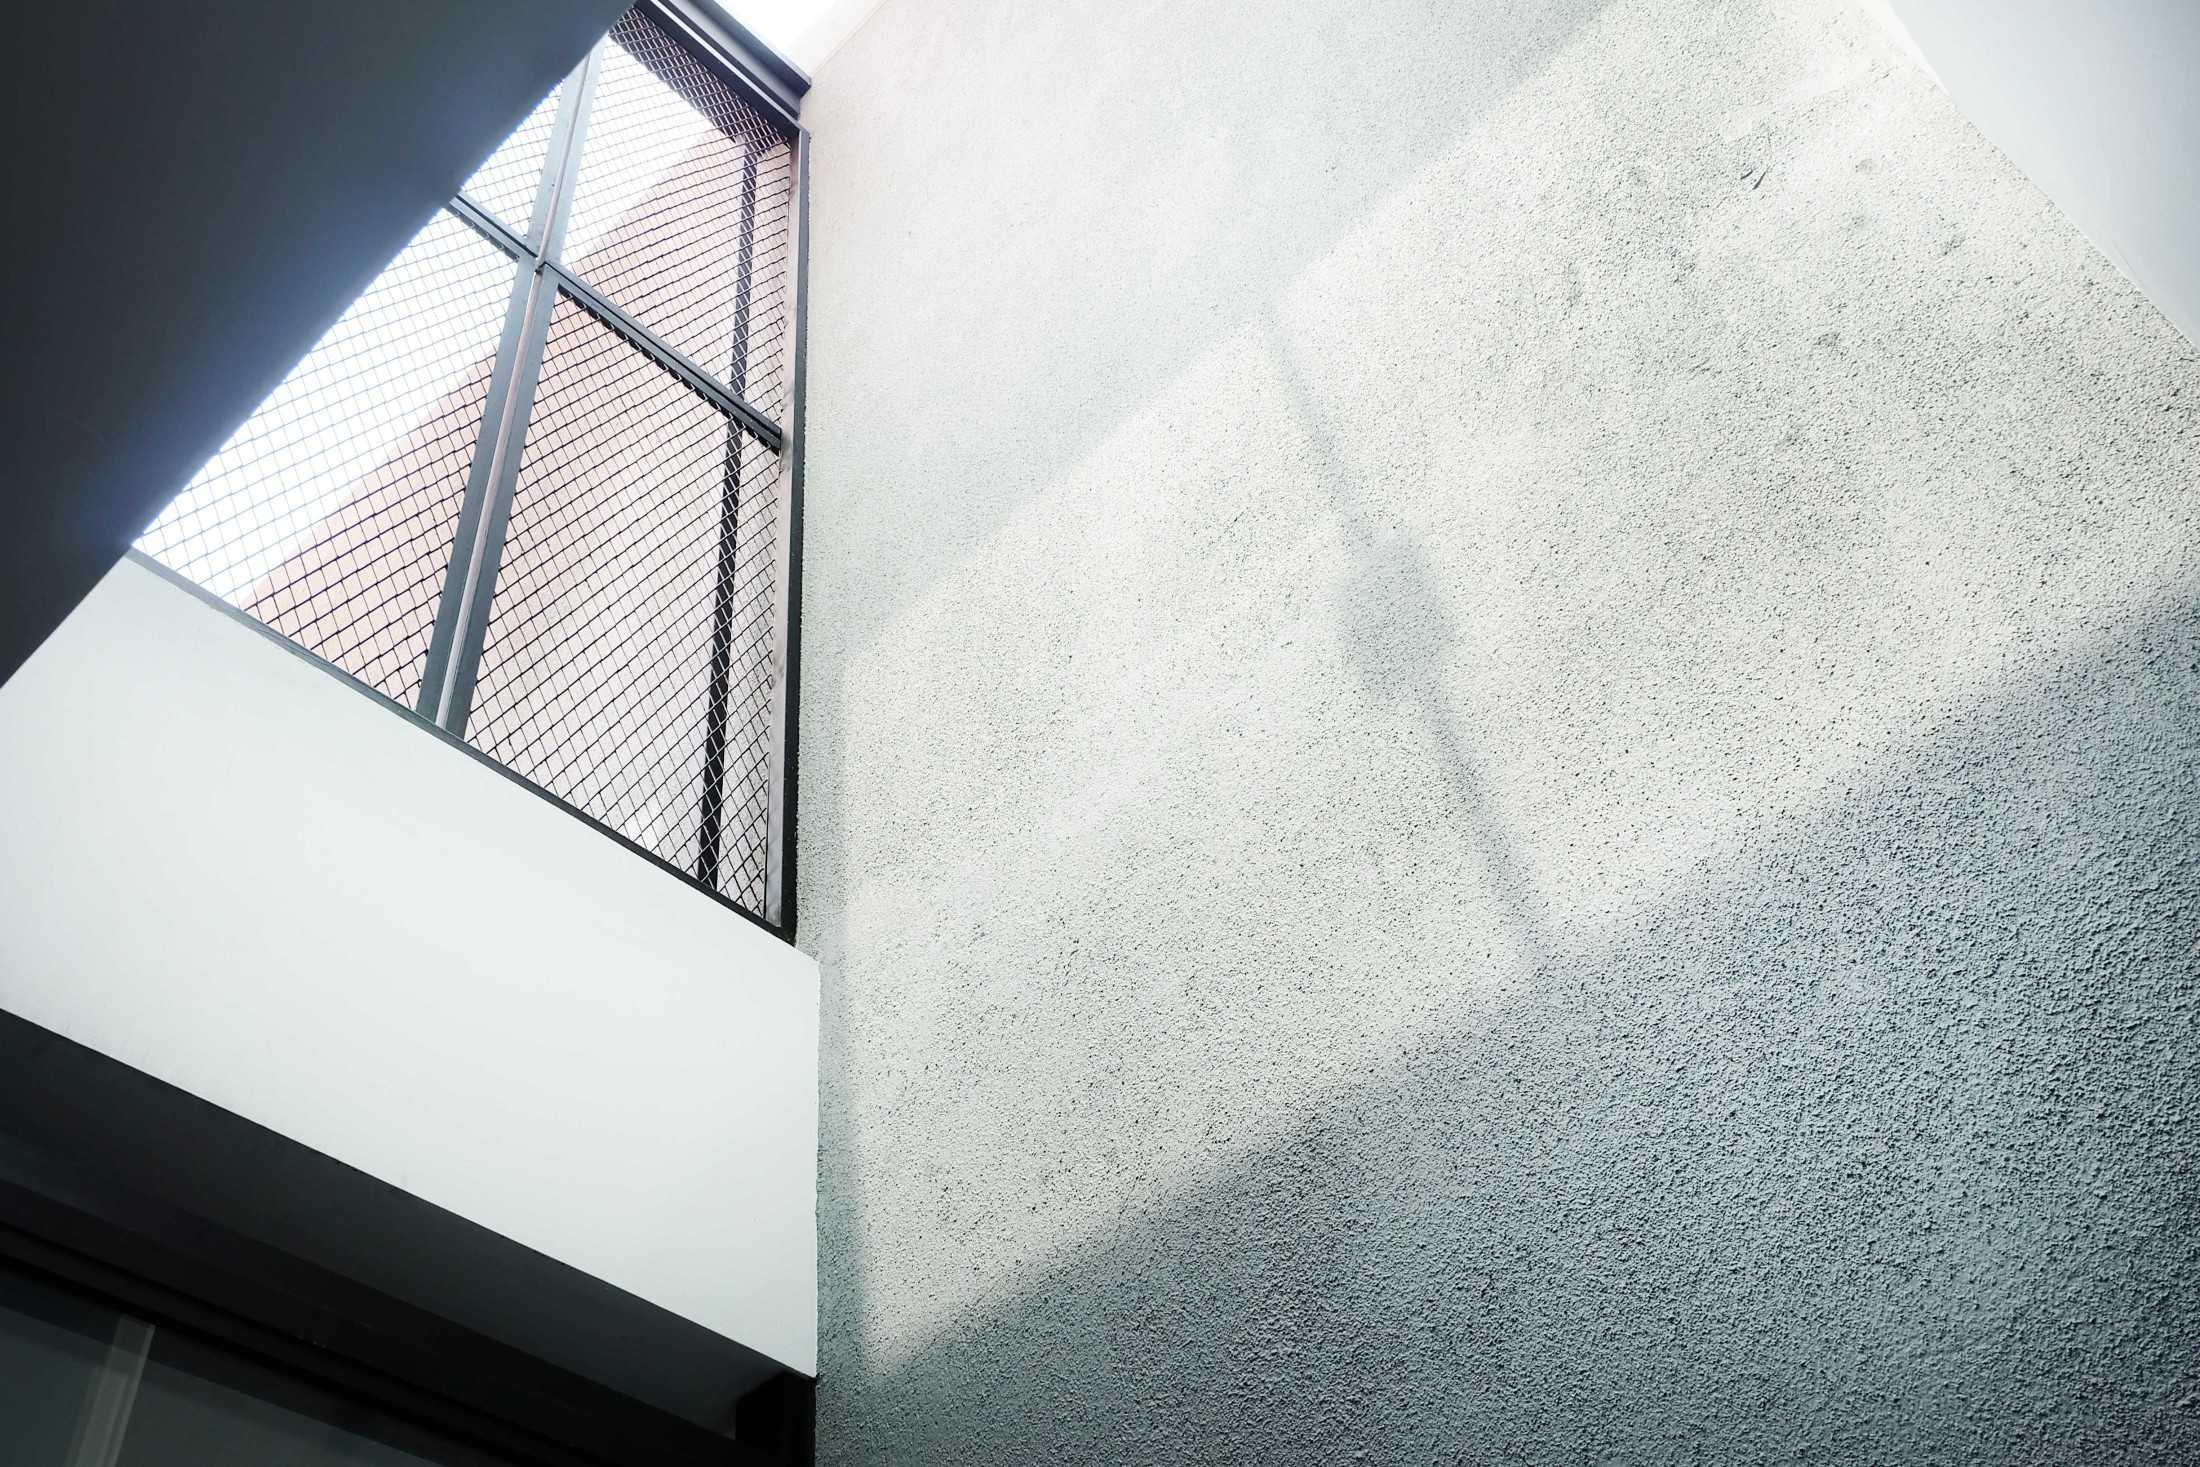 Dica Selaras 105 House Antapani, Kota Bandung, Jawa Barat, Indonesia Antapani, Kota Bandung, Jawa Barat, Indonesia Dica-Selaras-105-House  62331